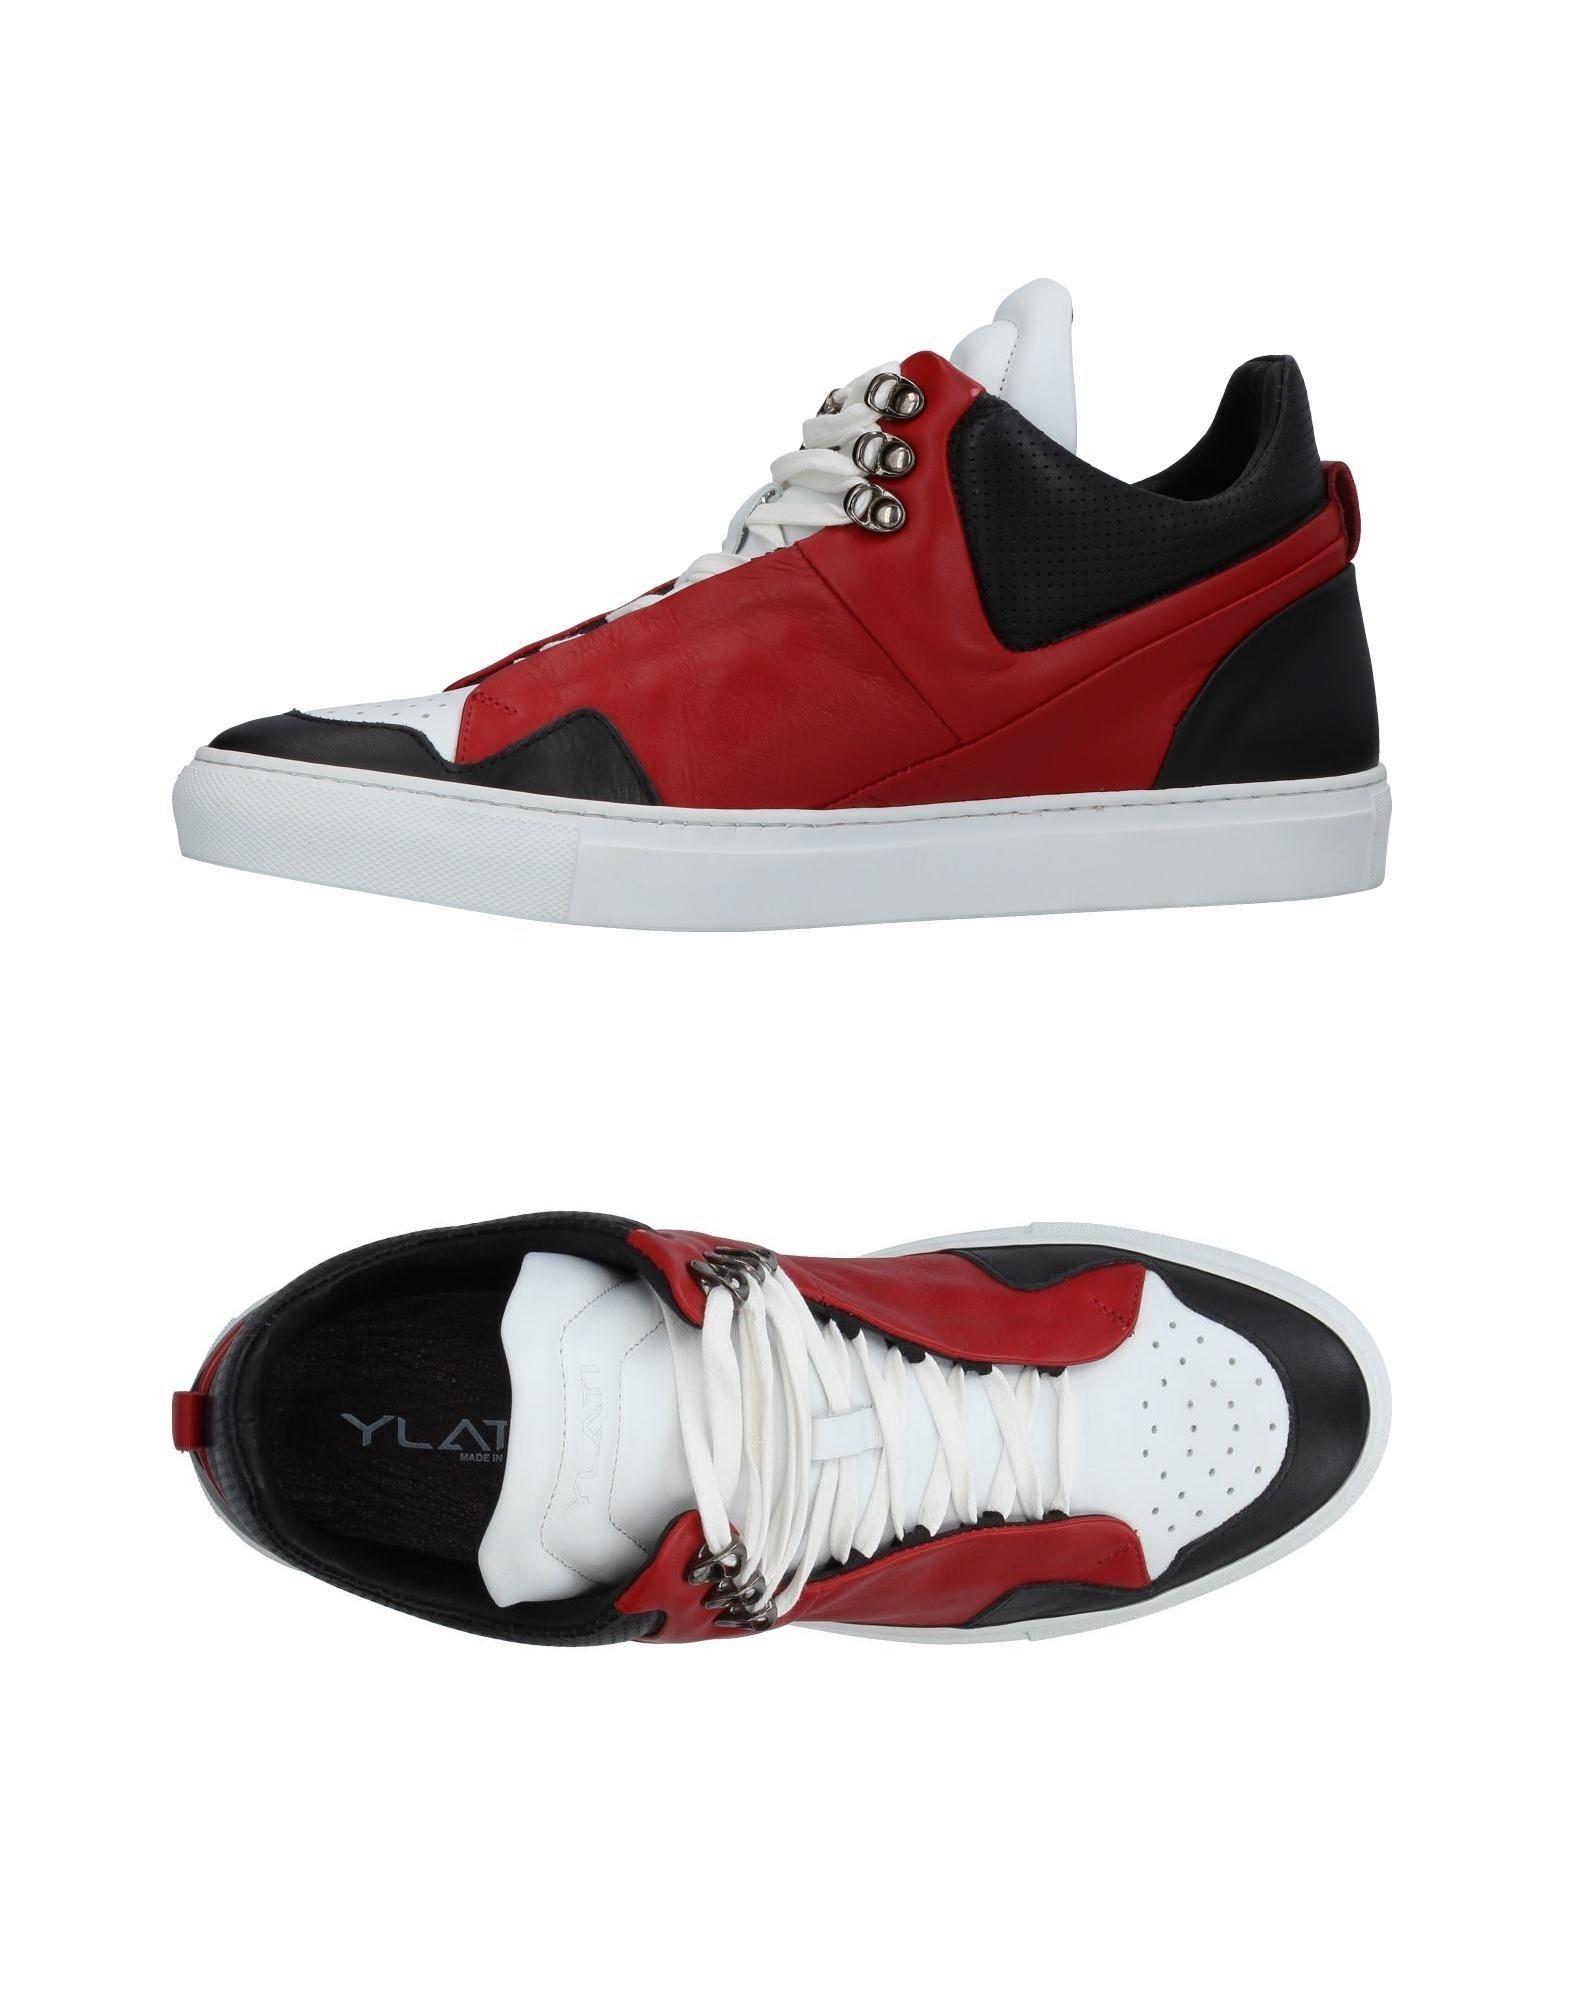 Ylati Sneakers Herren beliebte  11380010PD Gute Qualität beliebte Herren Schuhe af26a7